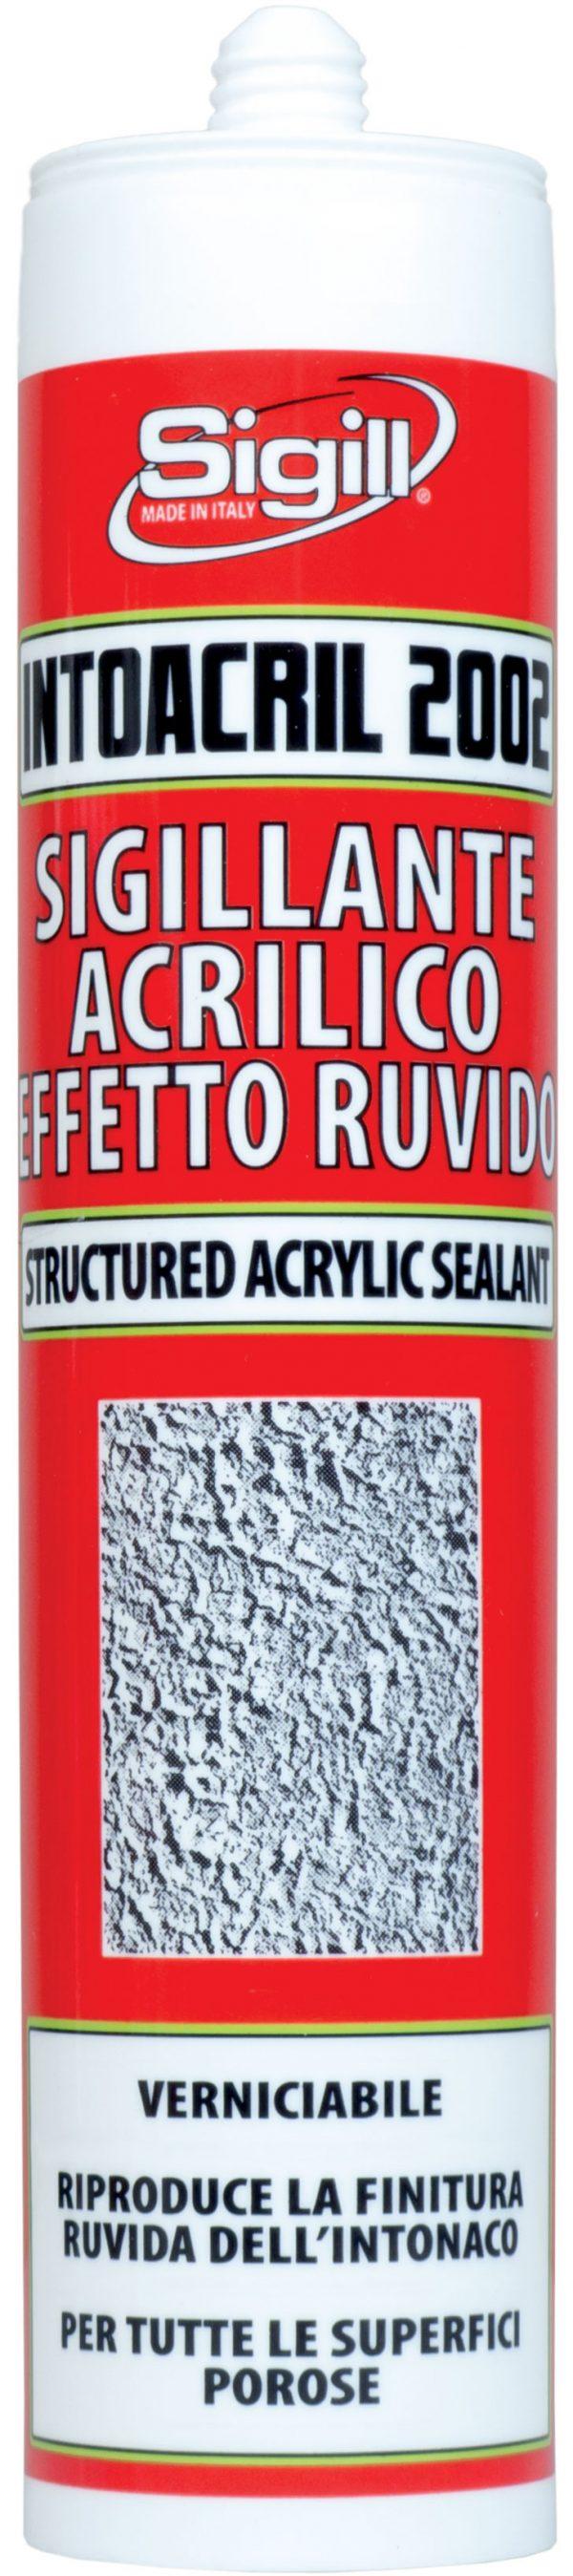 Acrylic sealant with fine grain plaster finish